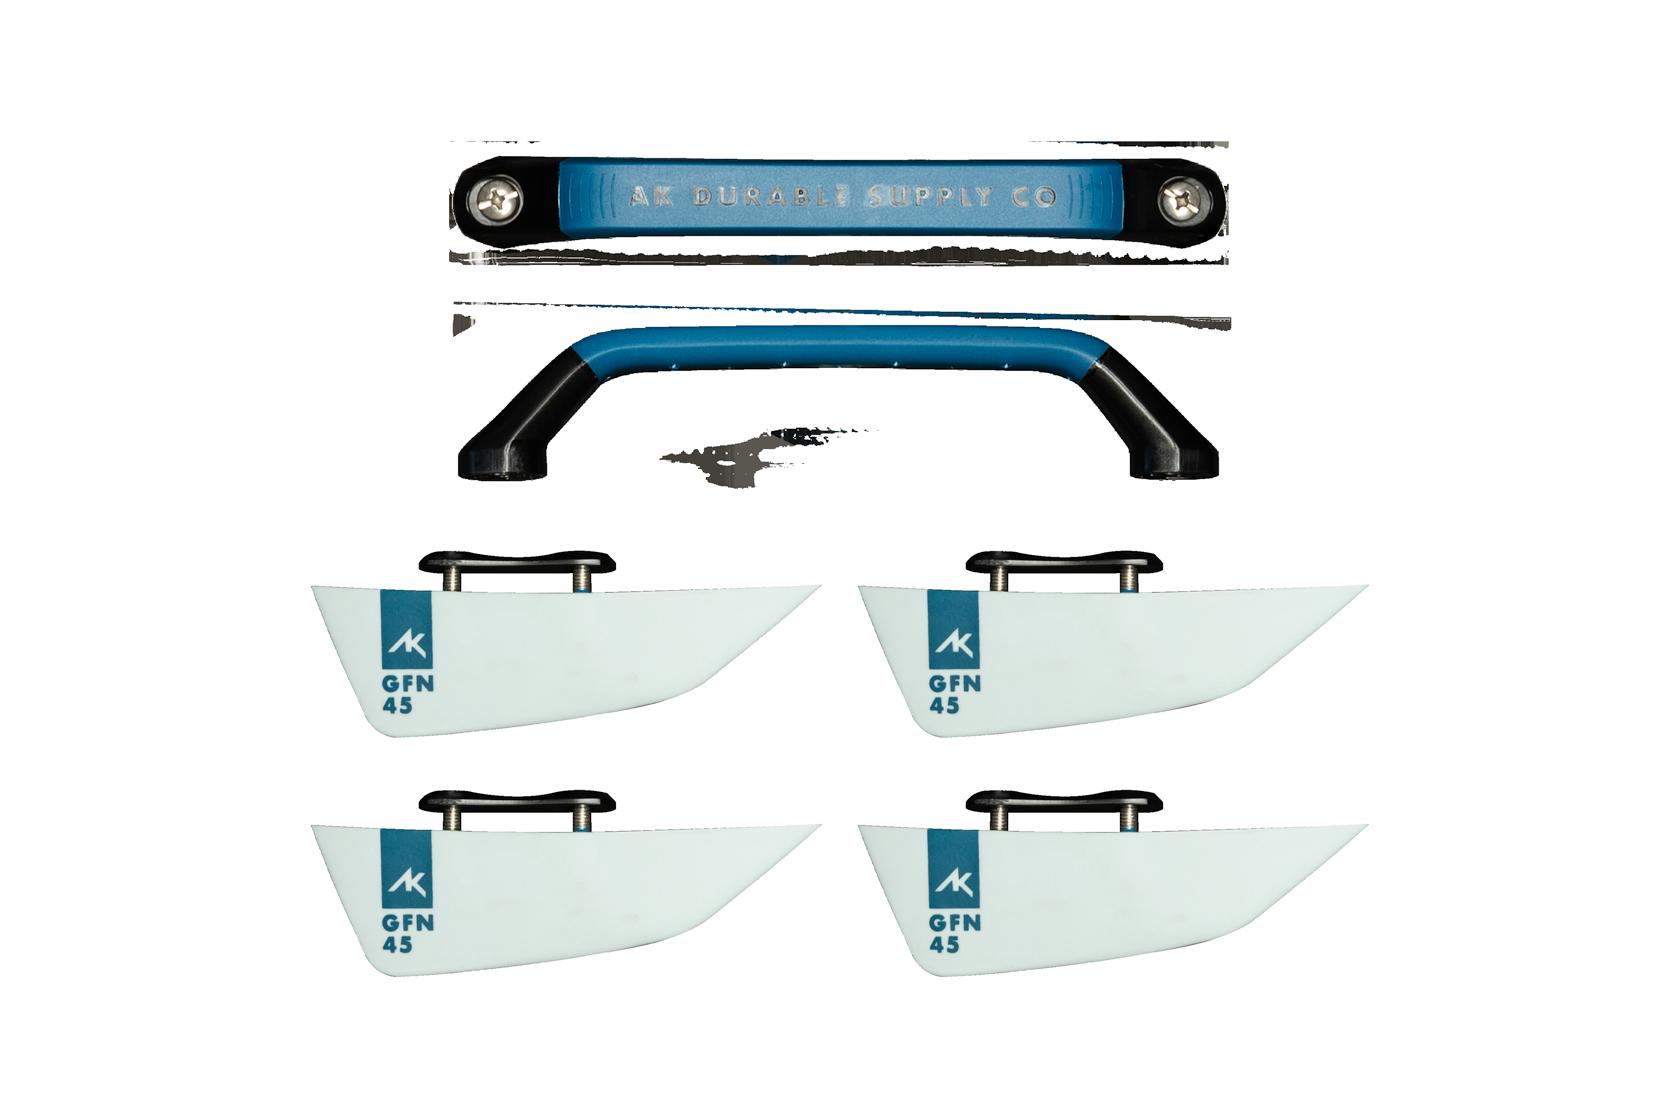 AK Fins and Handle Set